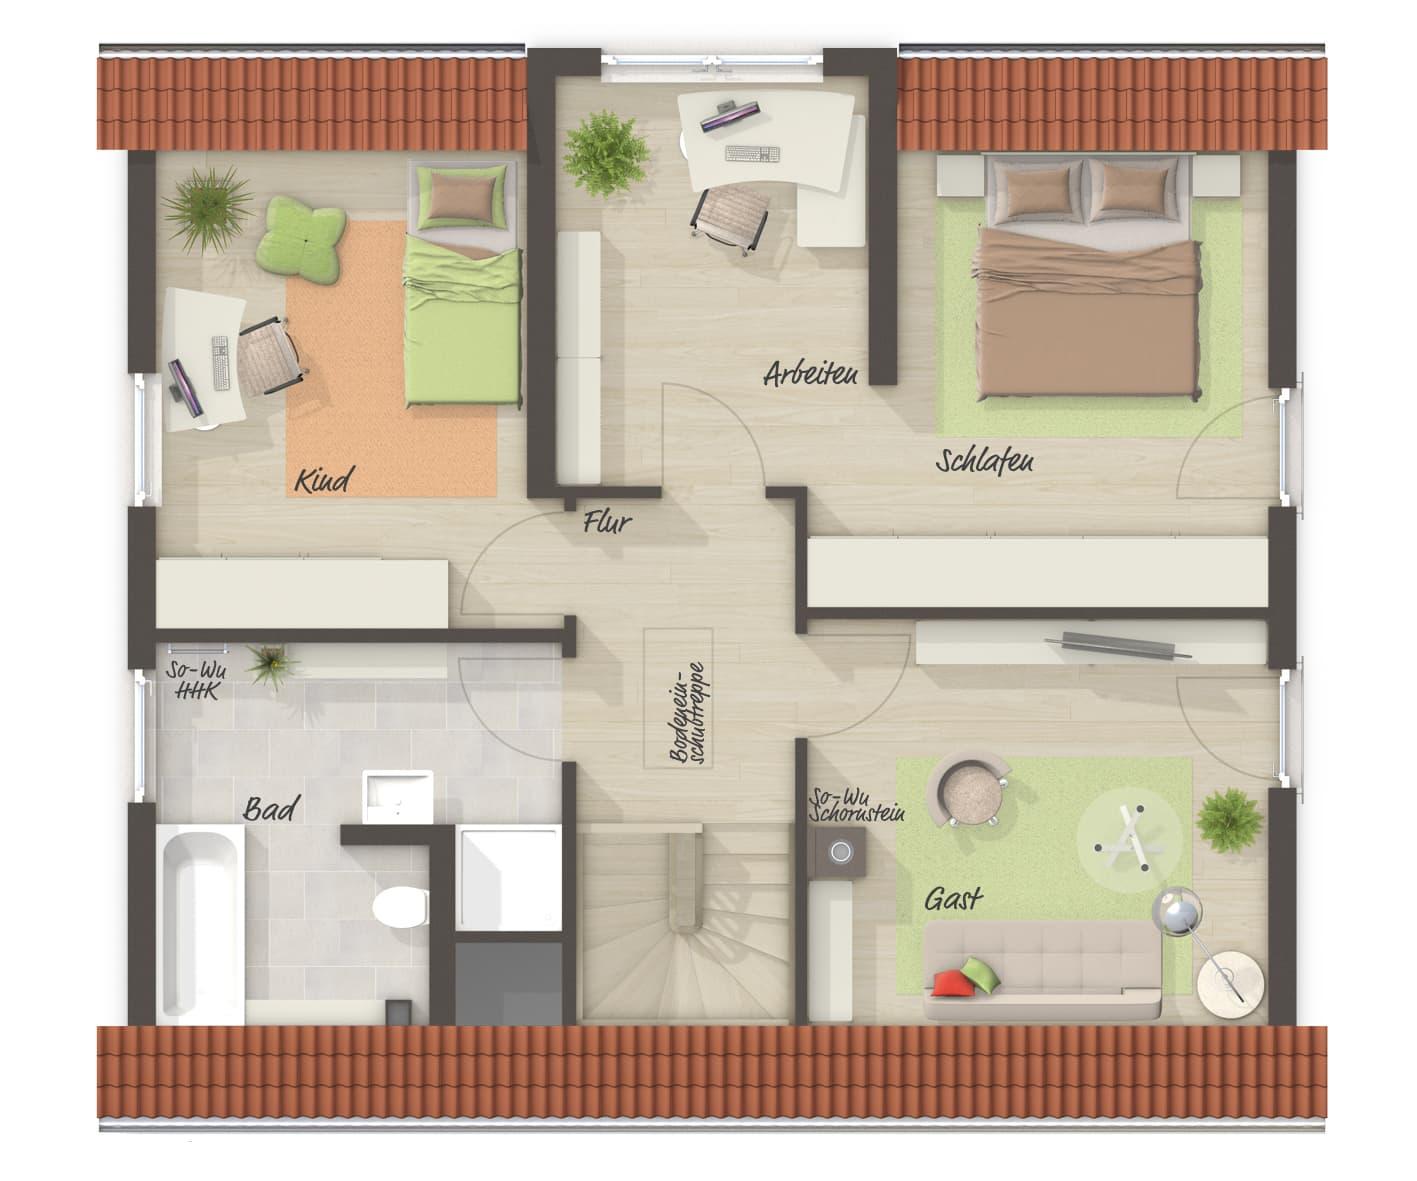 Einfamilienhaus Grundriss Obergeschoss mit Satteldach & Zwerchgiebel - Massivhaus schlüsselfertig bauen Ideen Town & Country Haus Lichthaus 121 Klinker - HausbauDirekt.de